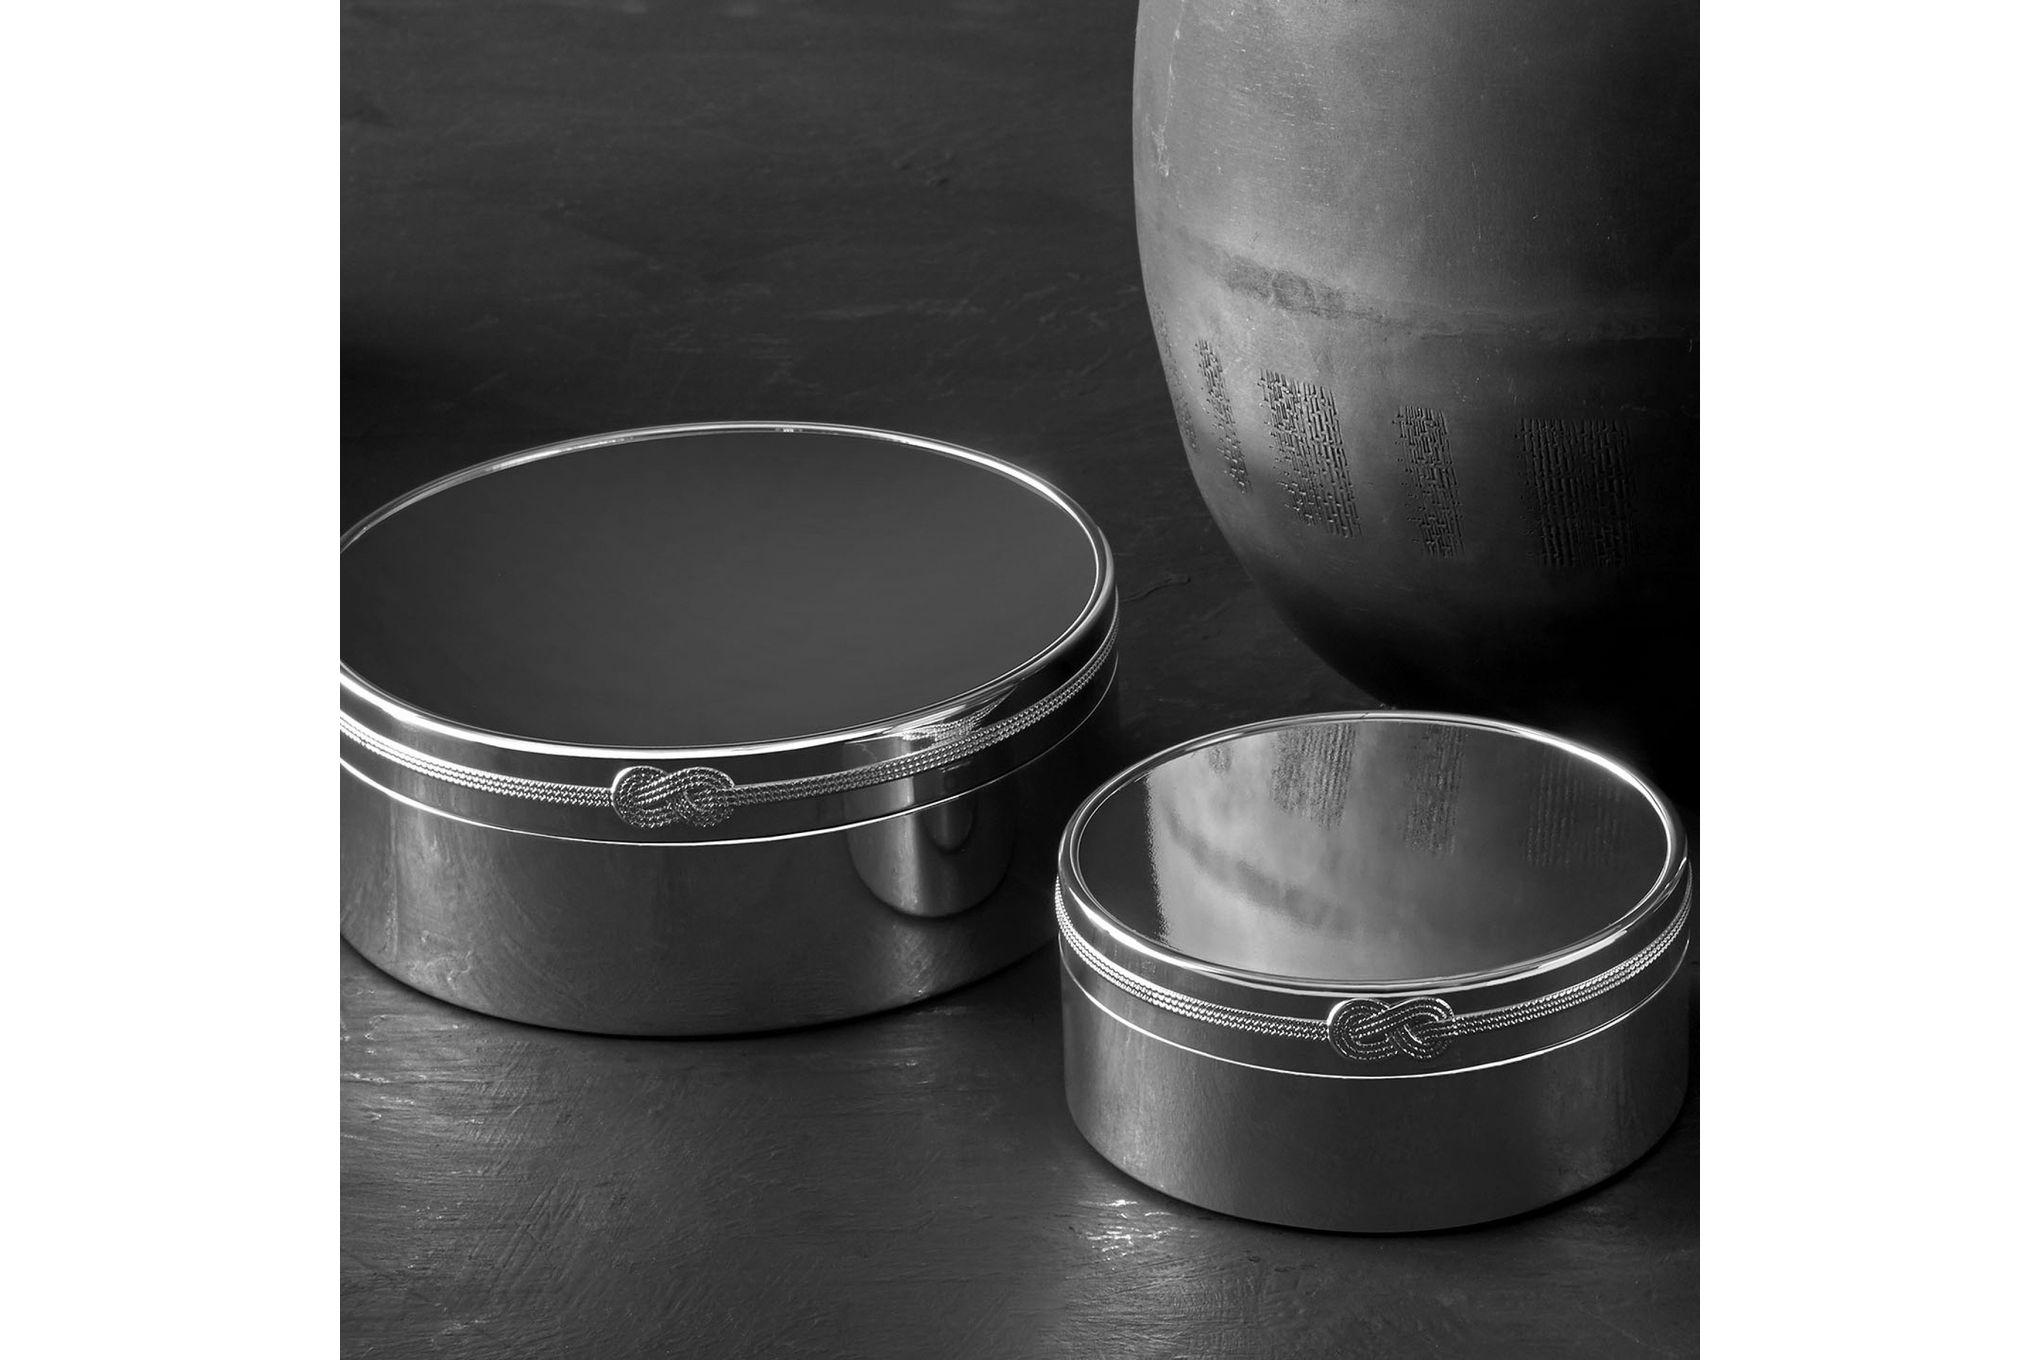 "Vera Wang for Wedgwood Gifts & Accessories Keepsake Box Infinity 7 1/2 x 3 1/2"" thumb 2"